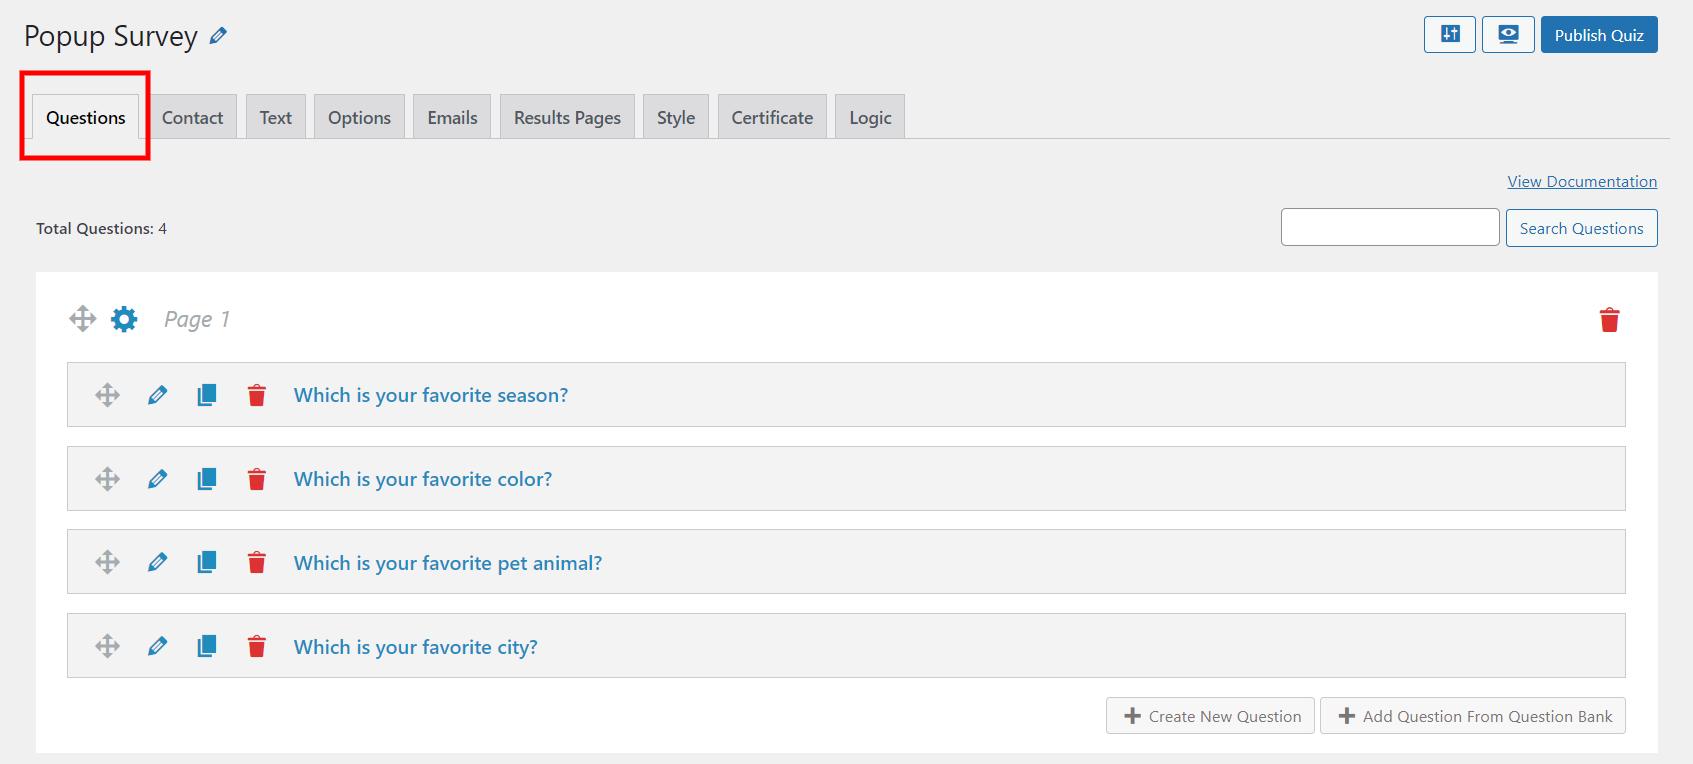 WordPress popup survey- Add questions